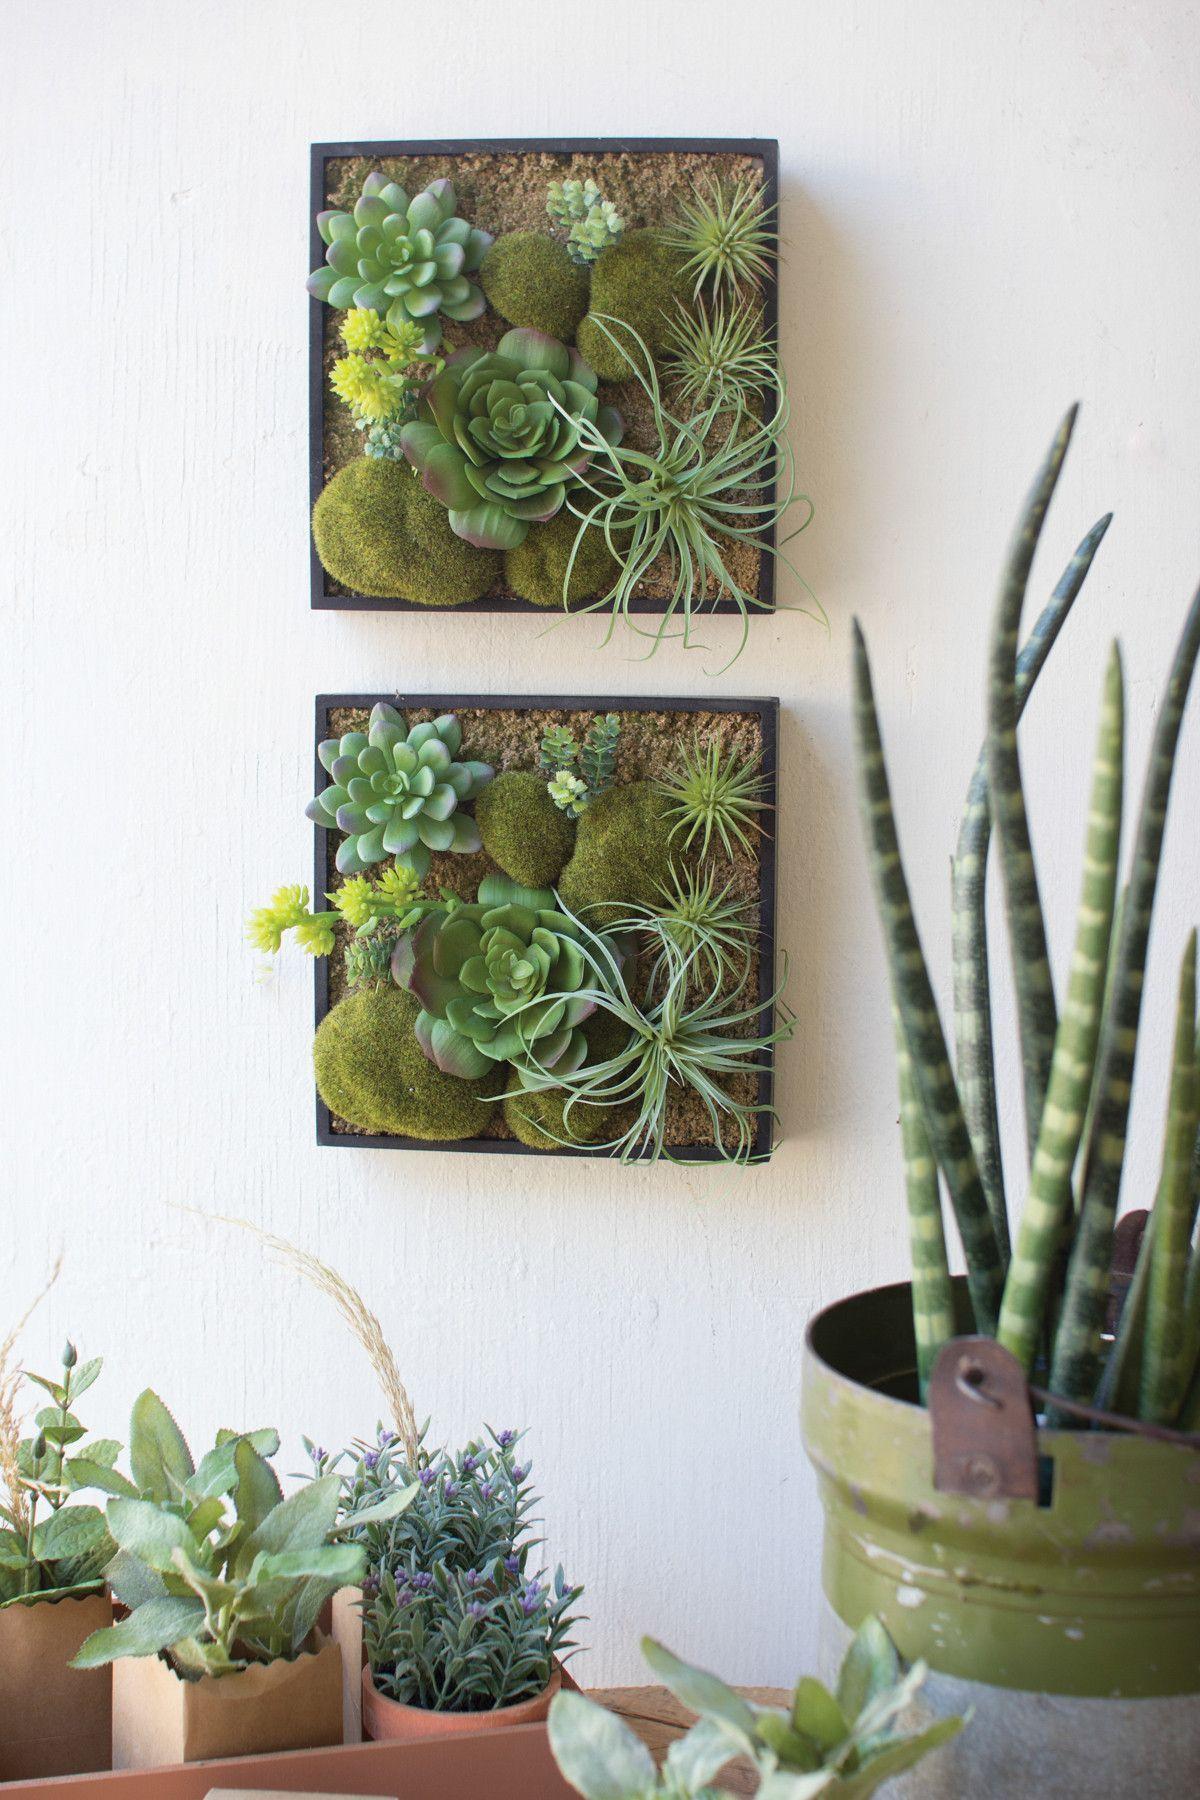 Good Kalalou Artificial Succulent Garden Wall Hanging With Wooden Box